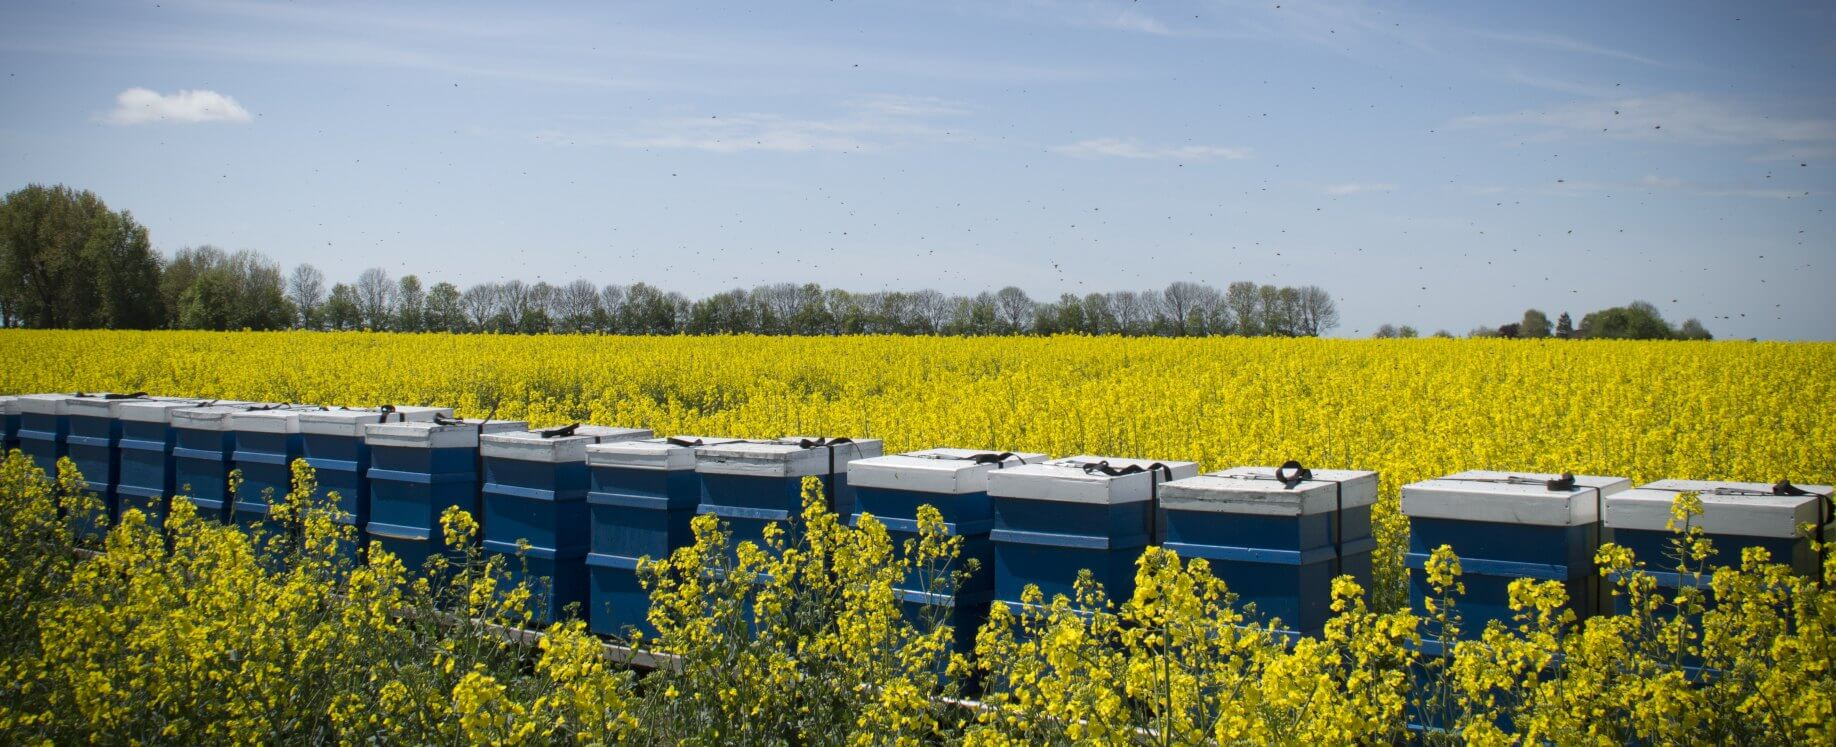 Blaue Bienenstöcke in gelben Feld